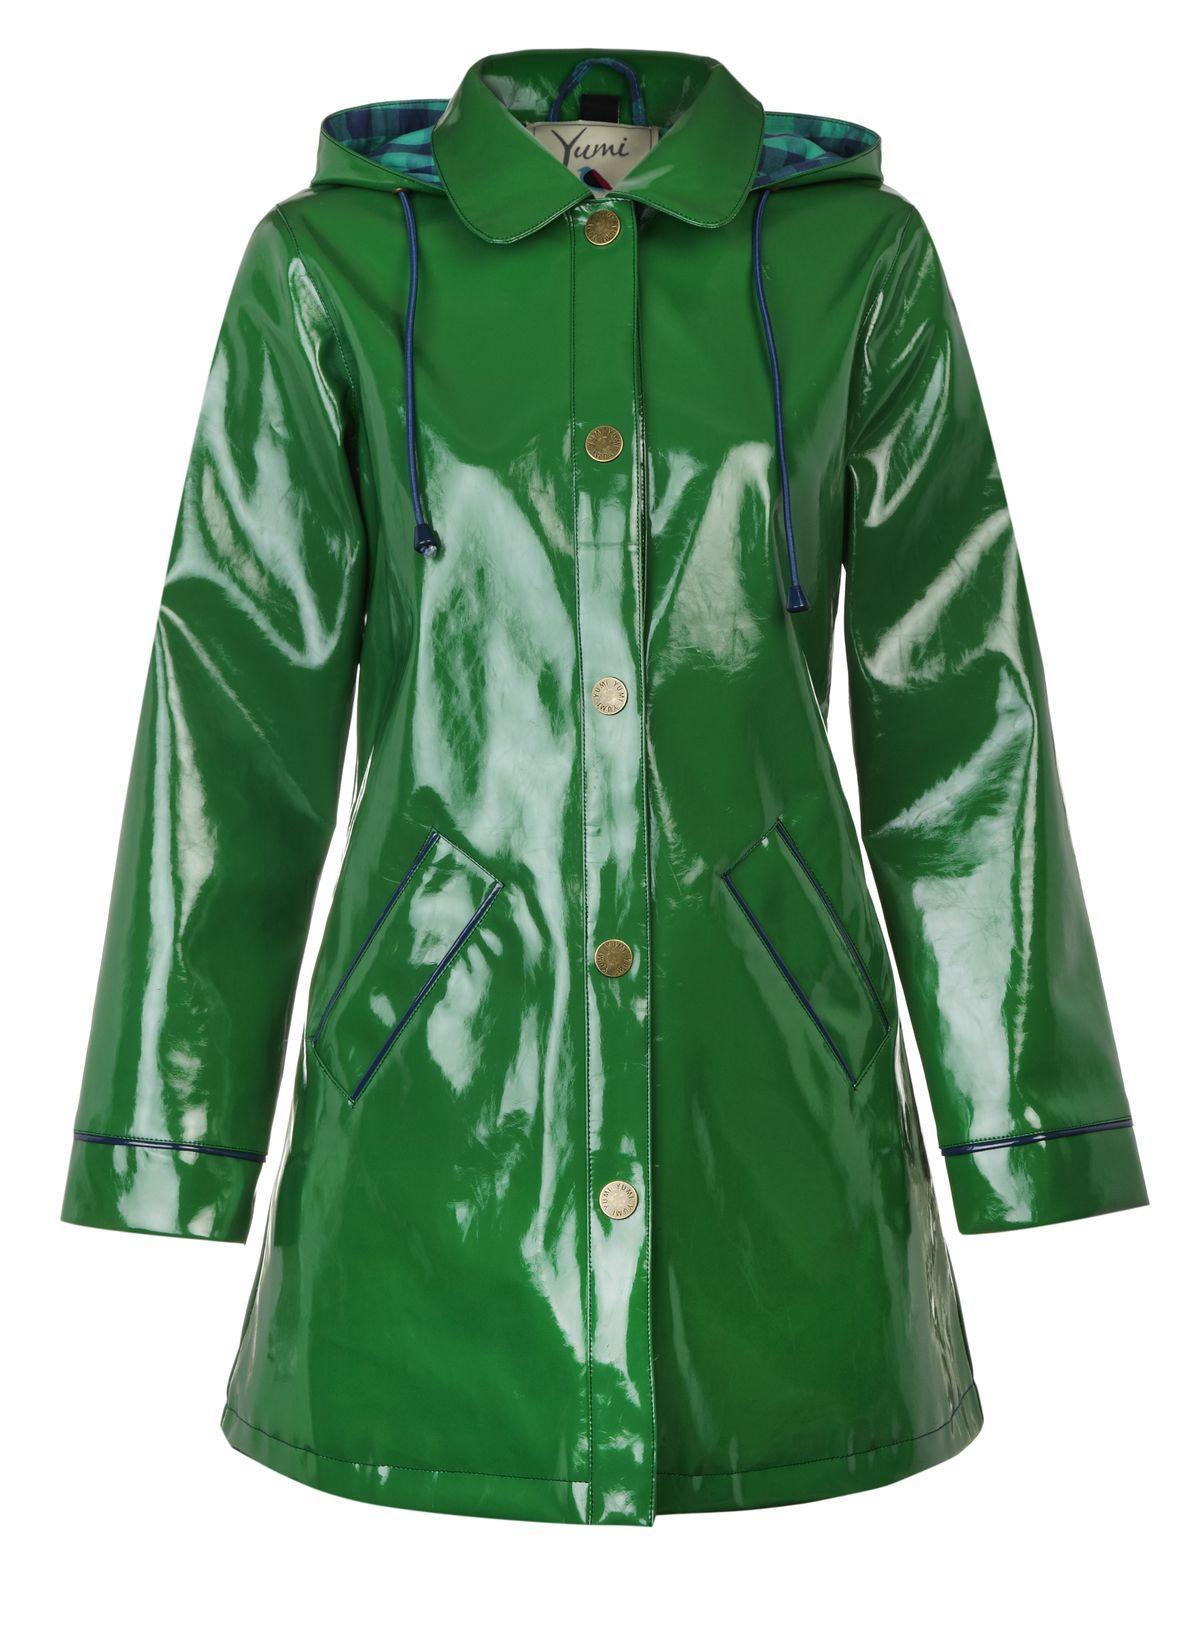 on sale 2019 wholesale price best supplier Shiney Mac @Yumi Direct #pintowin | Raincoat/wear | Green ...